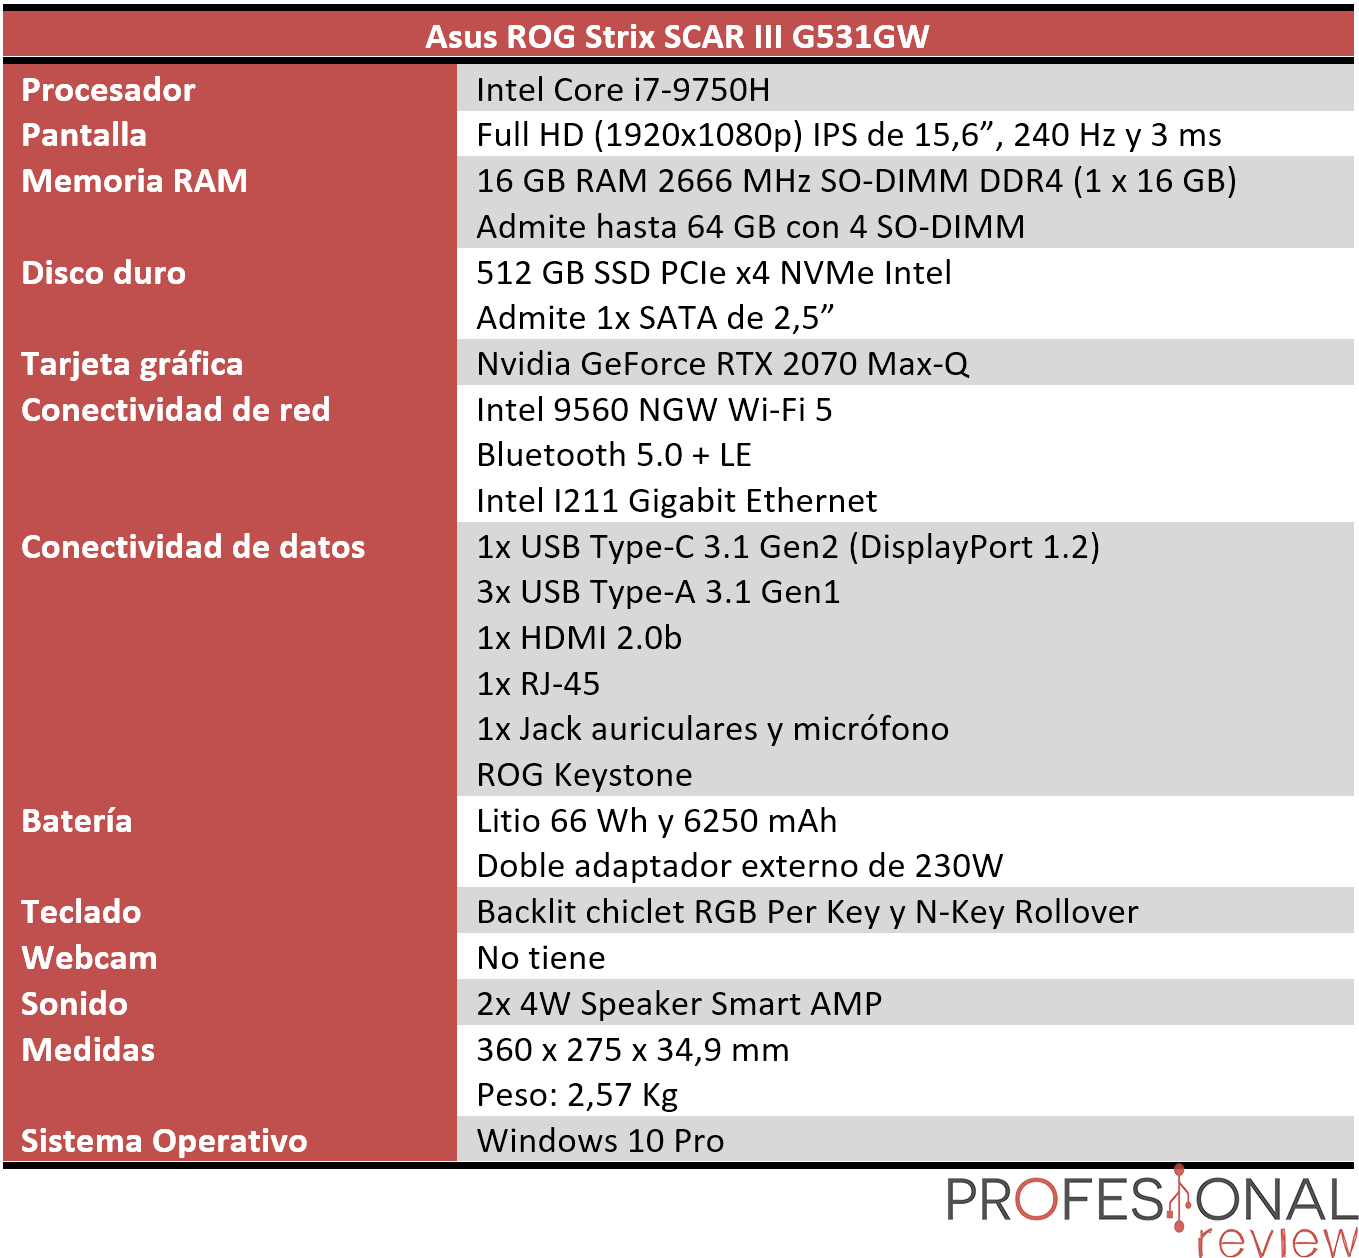 Asus ROG Strix SCAR III G531GW características